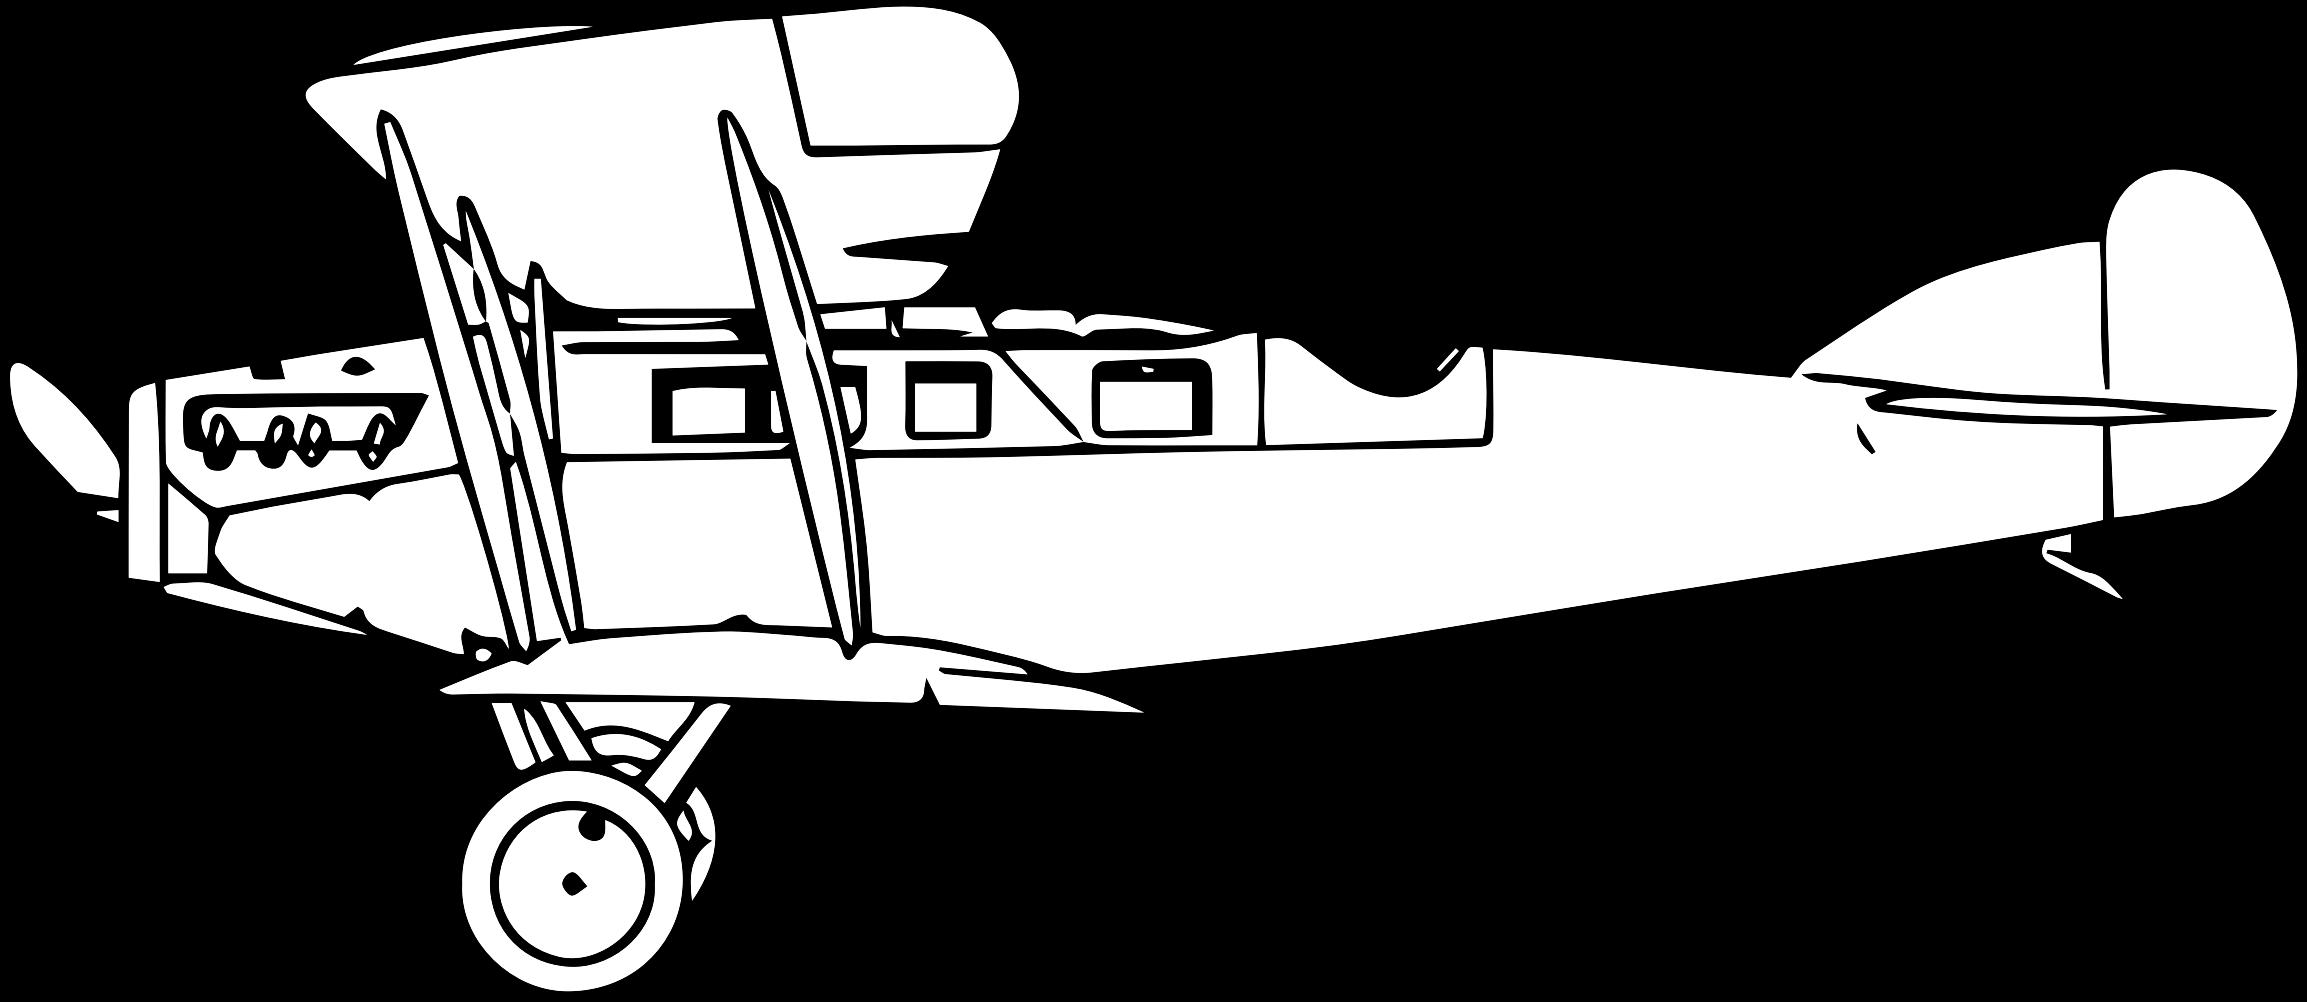 Martinsyde a mark ii. Biplane clipart line